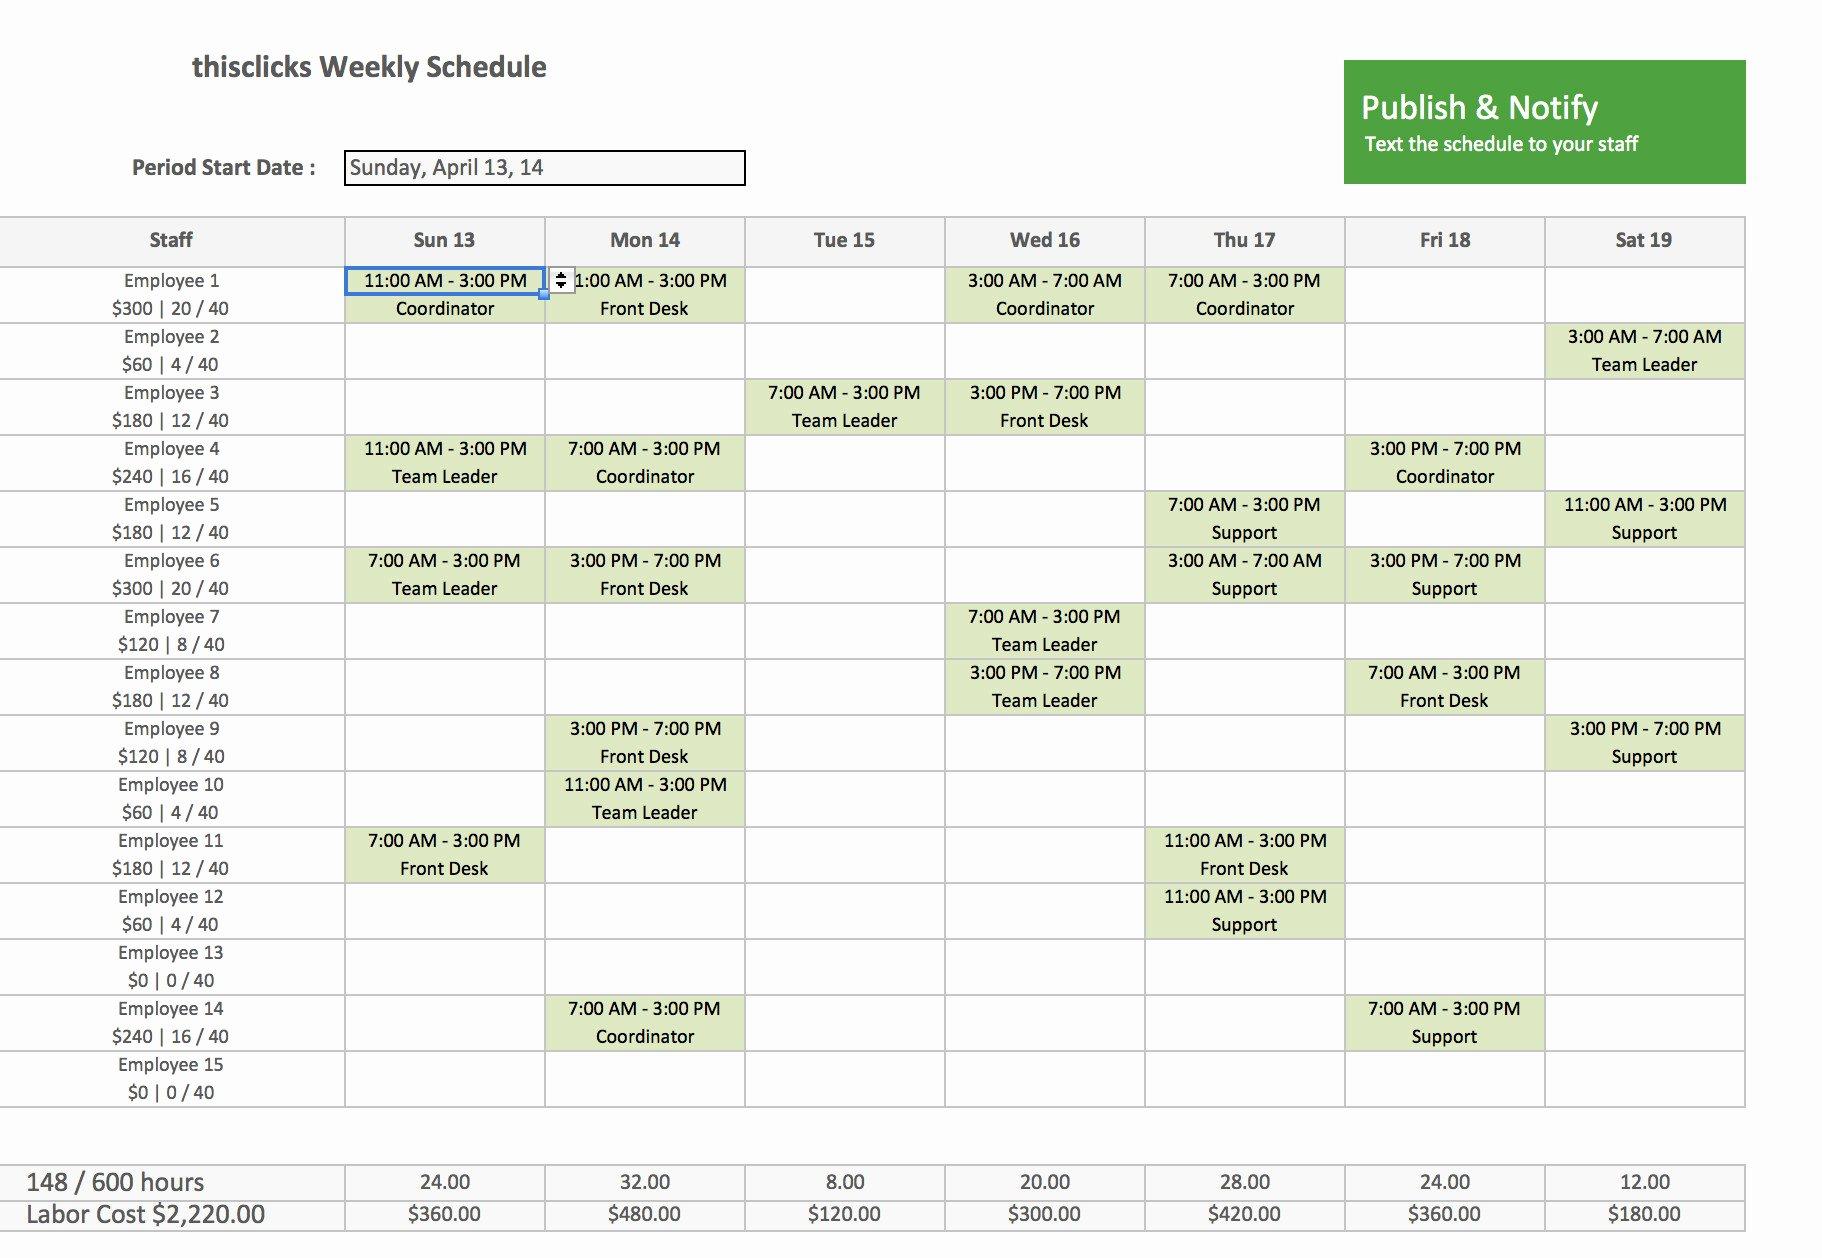 Training Calendar Template Excel New Employee Training Schedule Template Excel Schedule